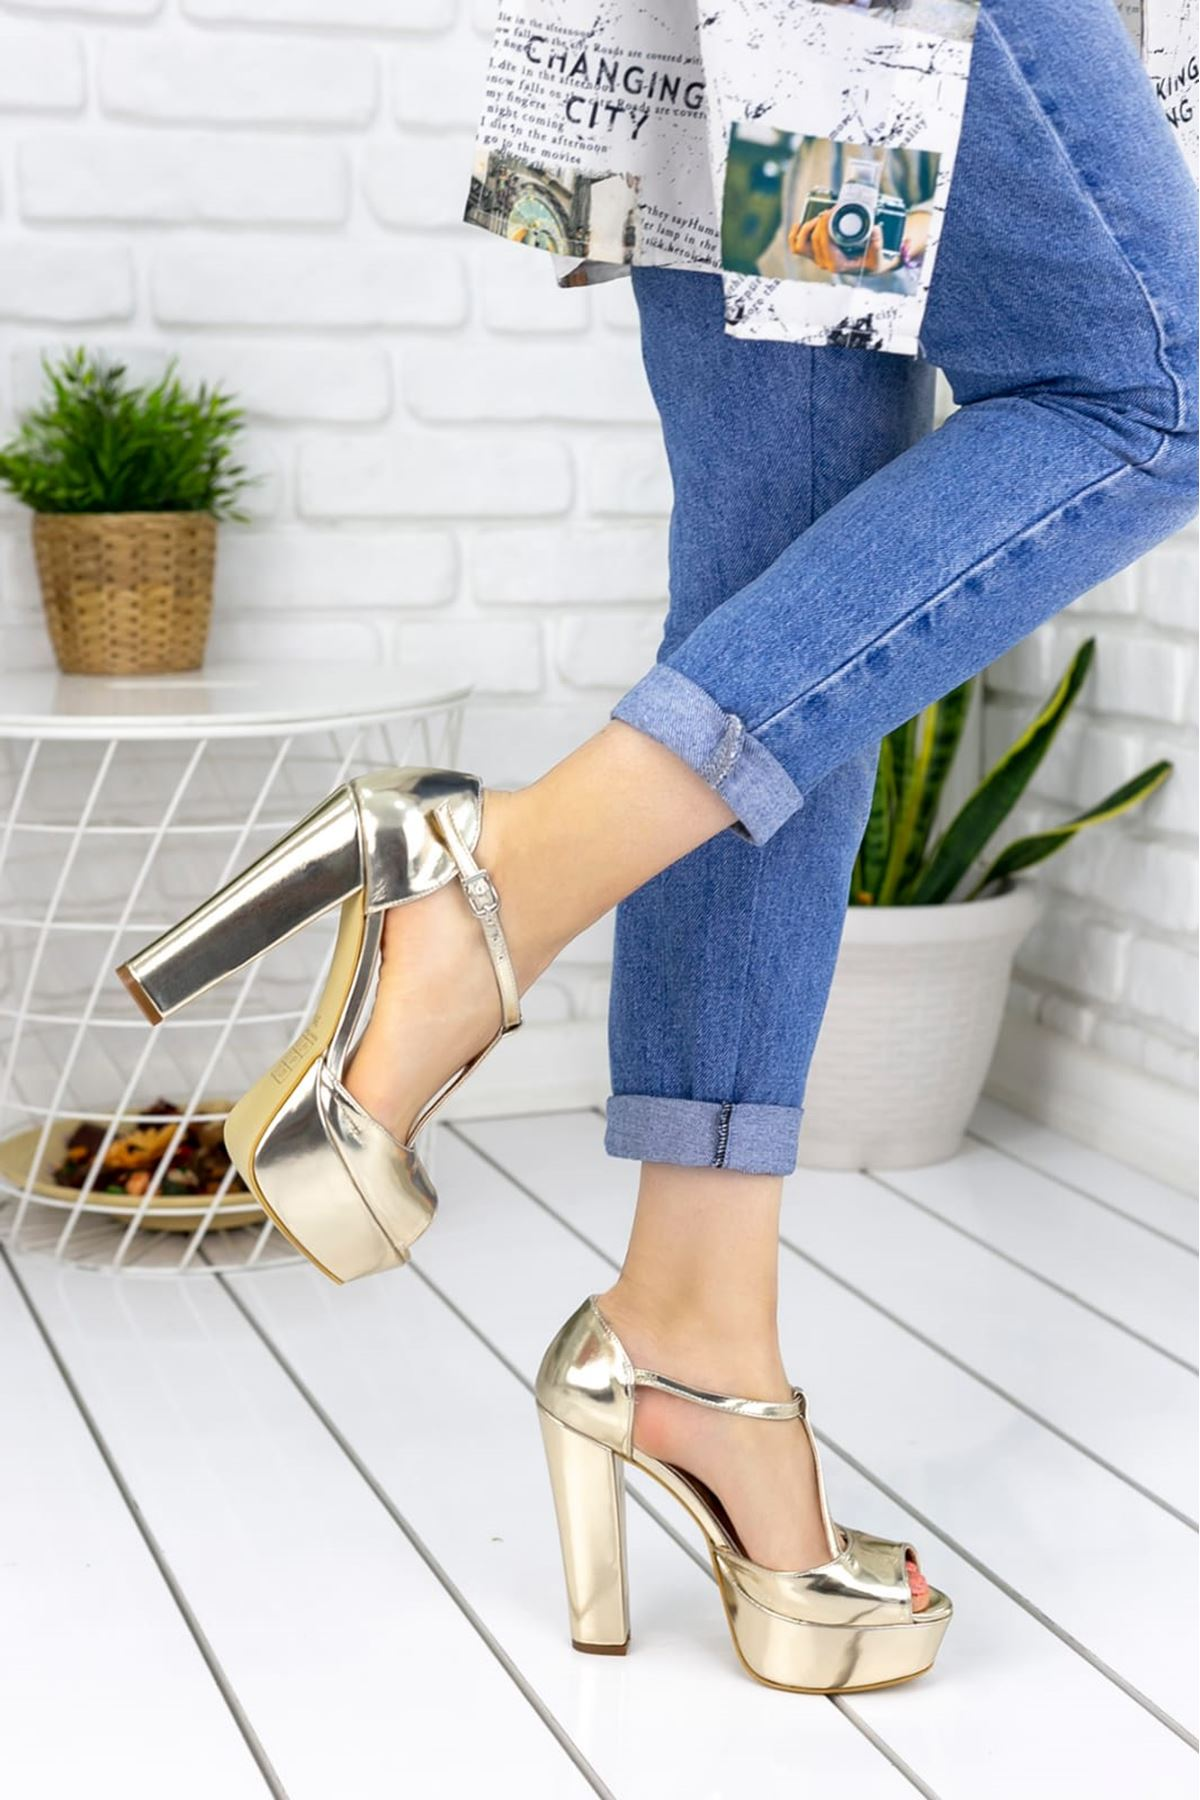 Asena Rugan Tek Bant Yüksek Topuklu Ayakkabı Gold